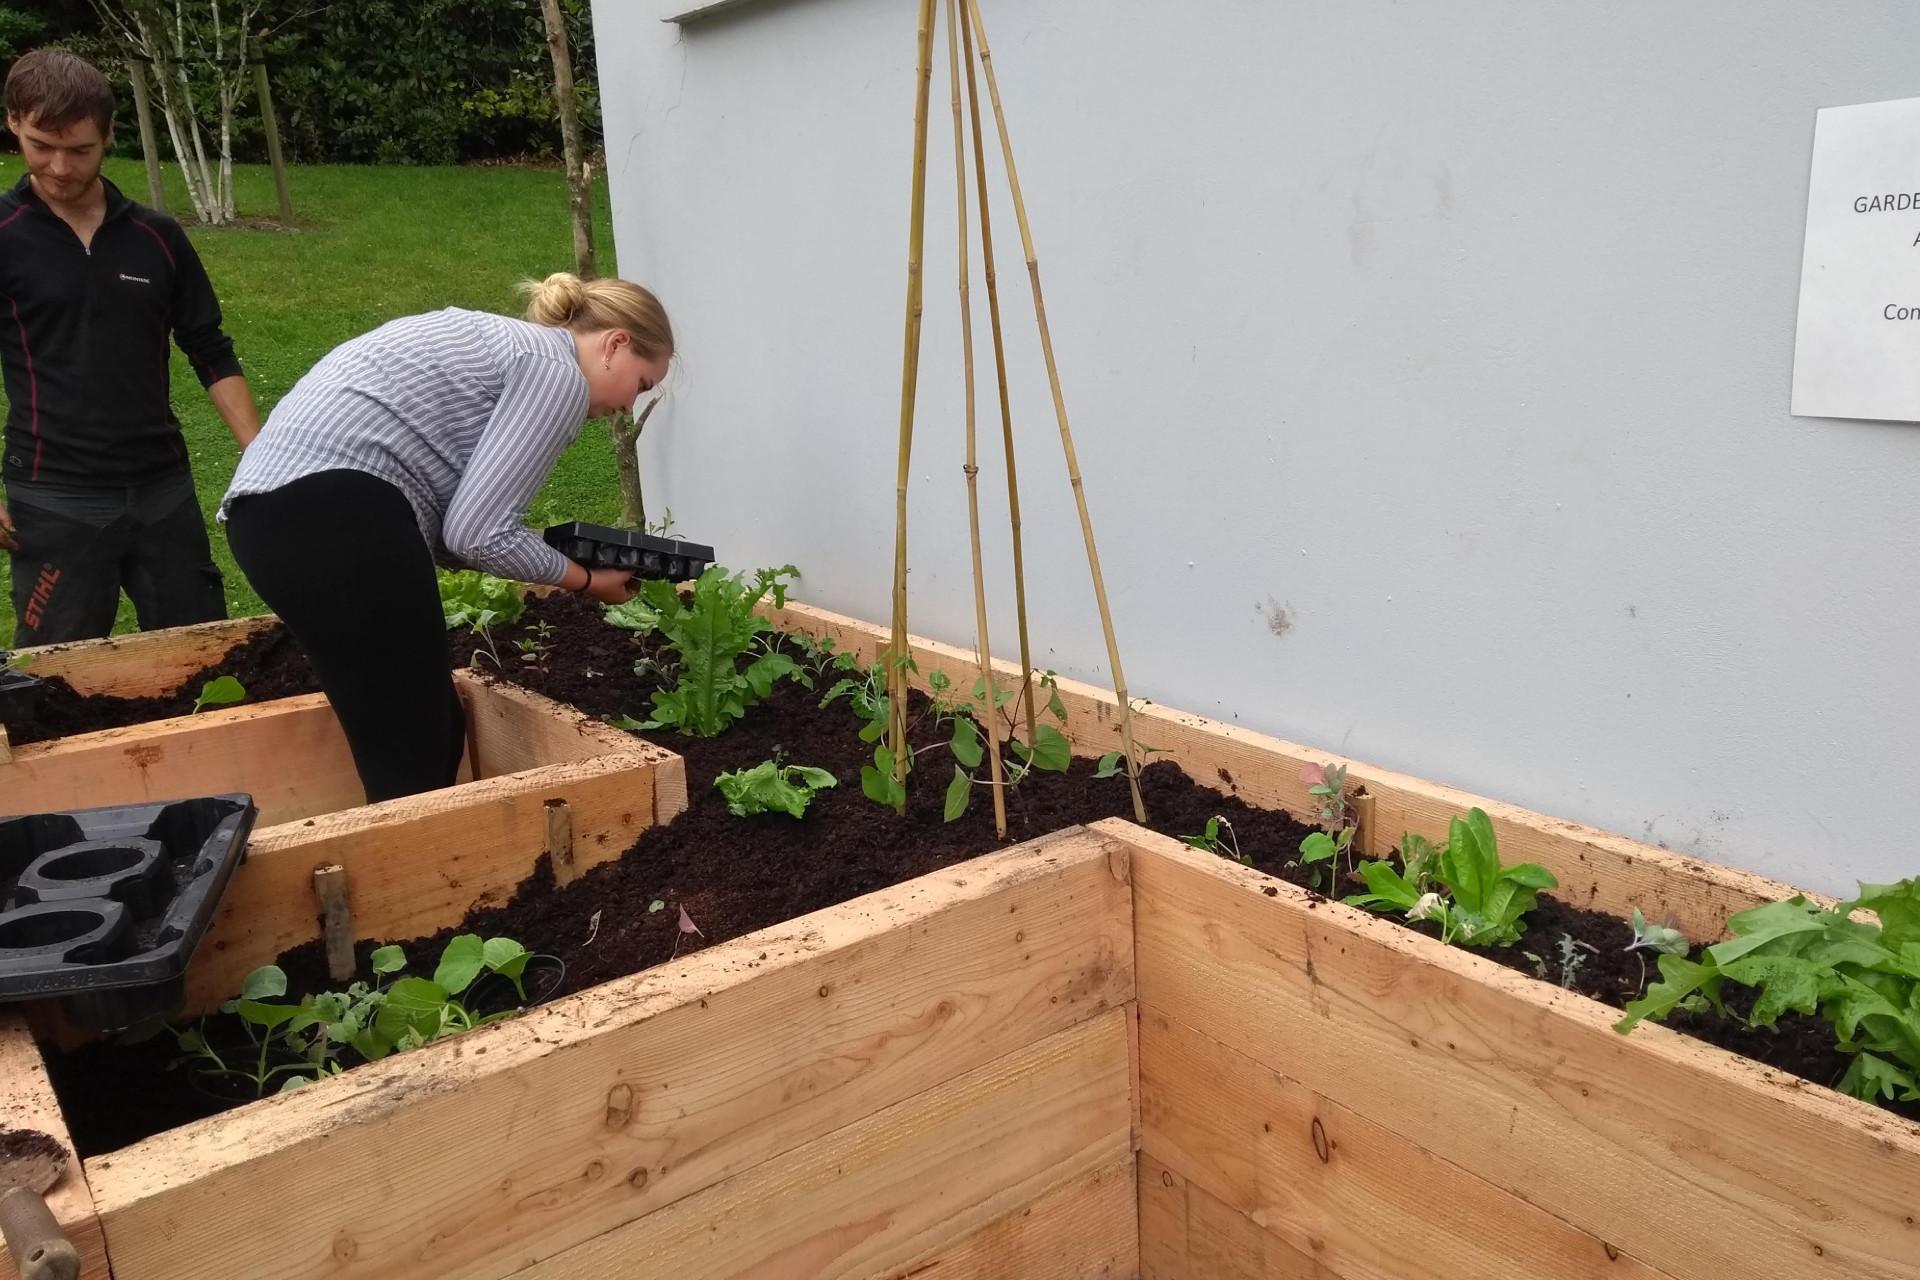 Incredible Edible Ambleside volunteers planting up a veg bed